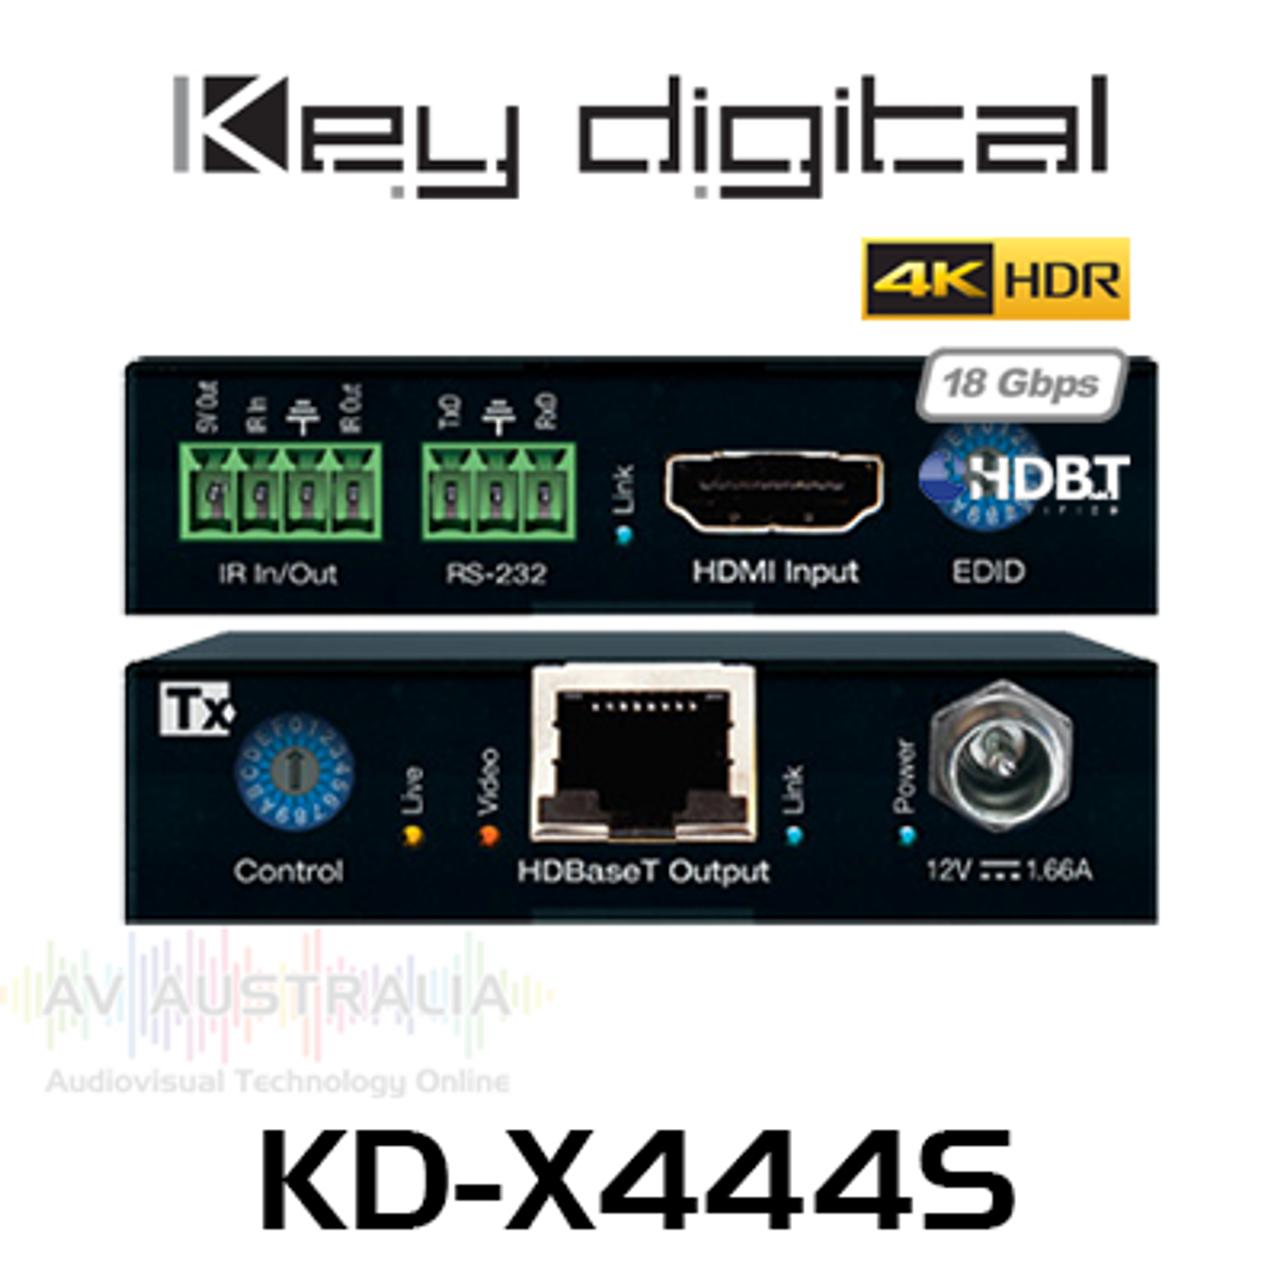 Key Digital KD-X444S 4K/18G PoH HDBaseT HDMI Extender Kit (40m)